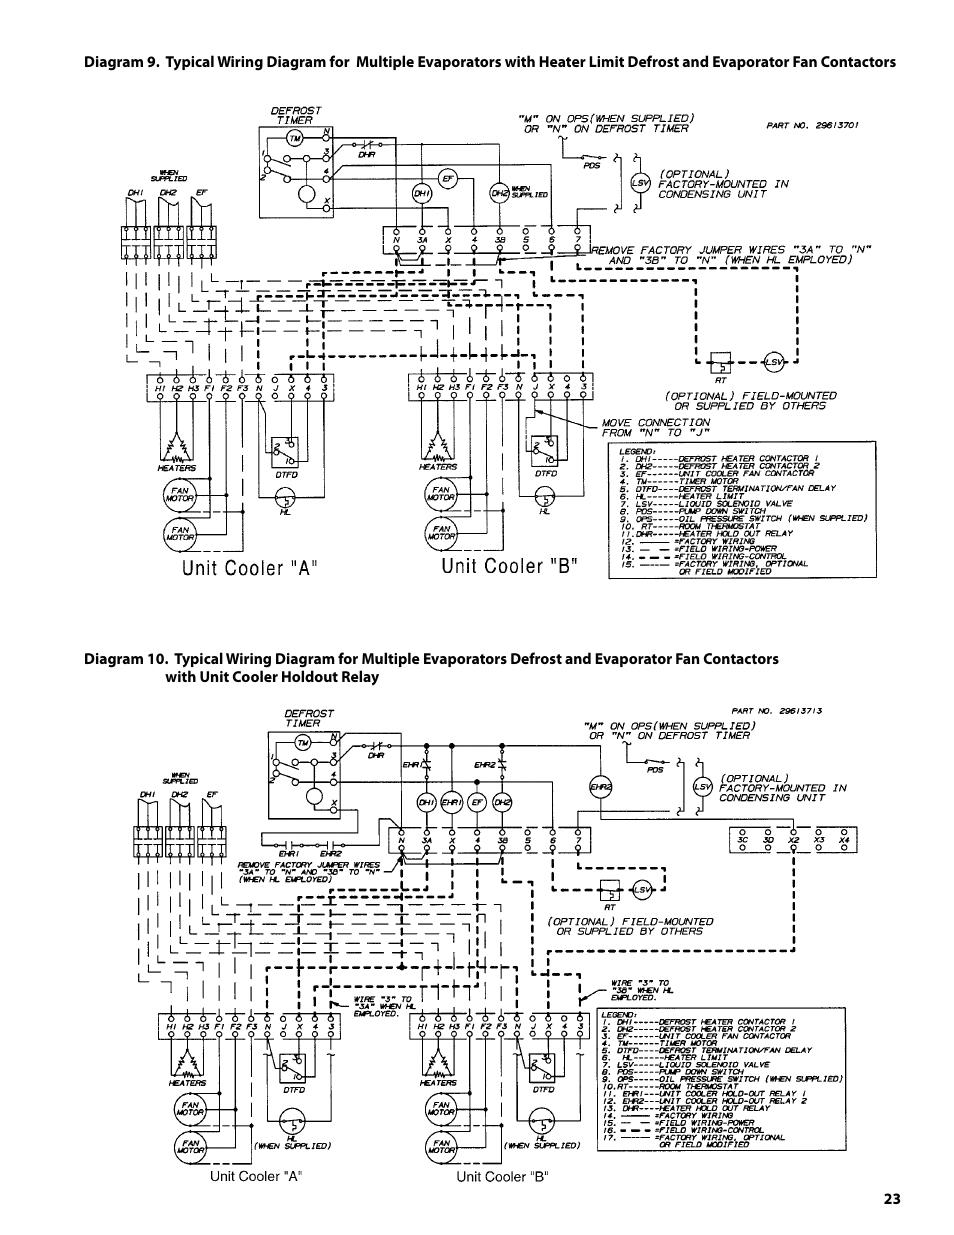 heatcraft walk in freezer wiring diagram collection walk in freezer wiring diagram heatcraft refrigeration products